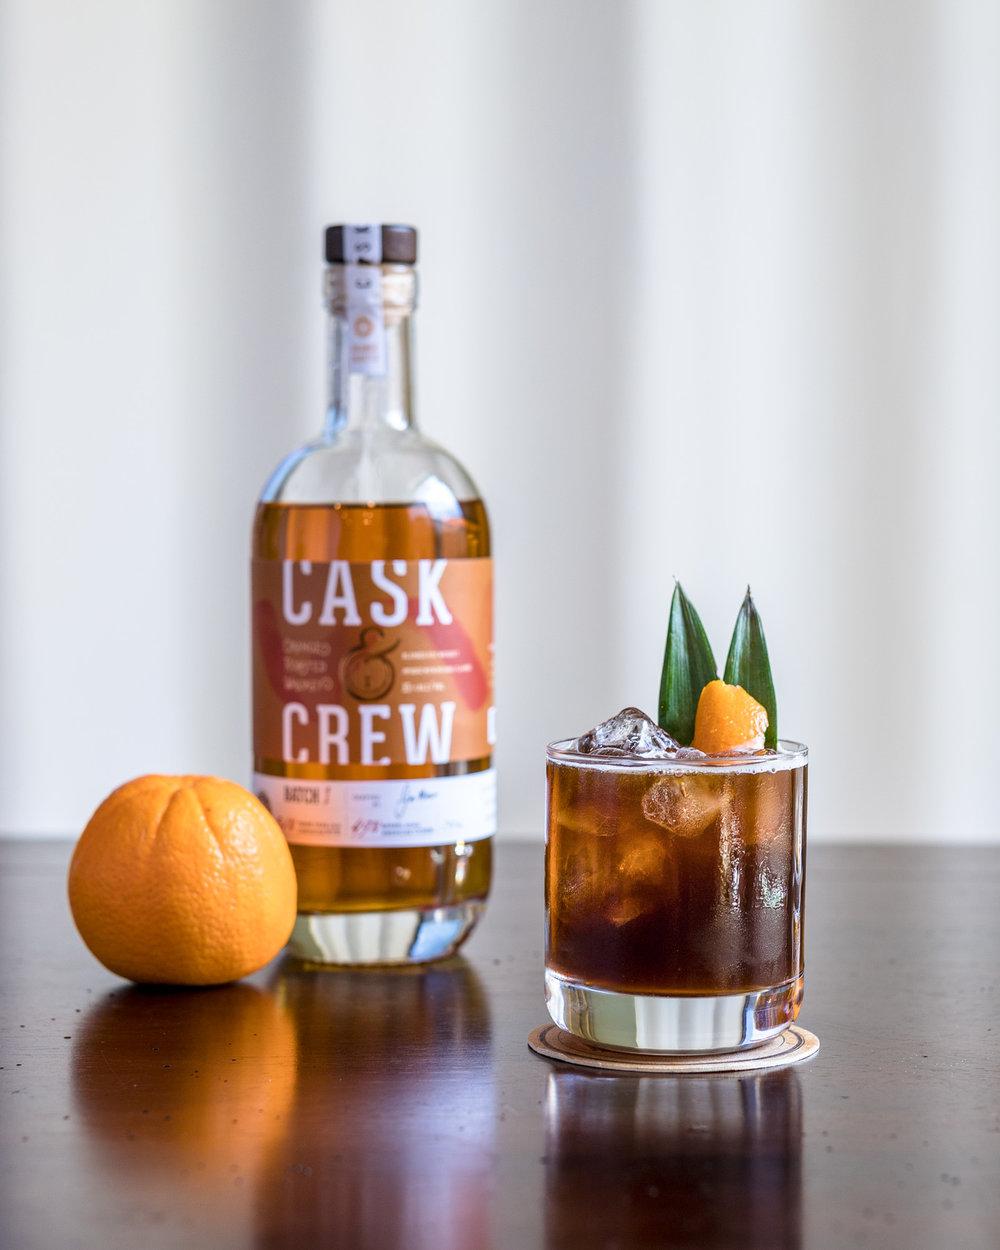 caskcrew_coffeecocktail.jpg